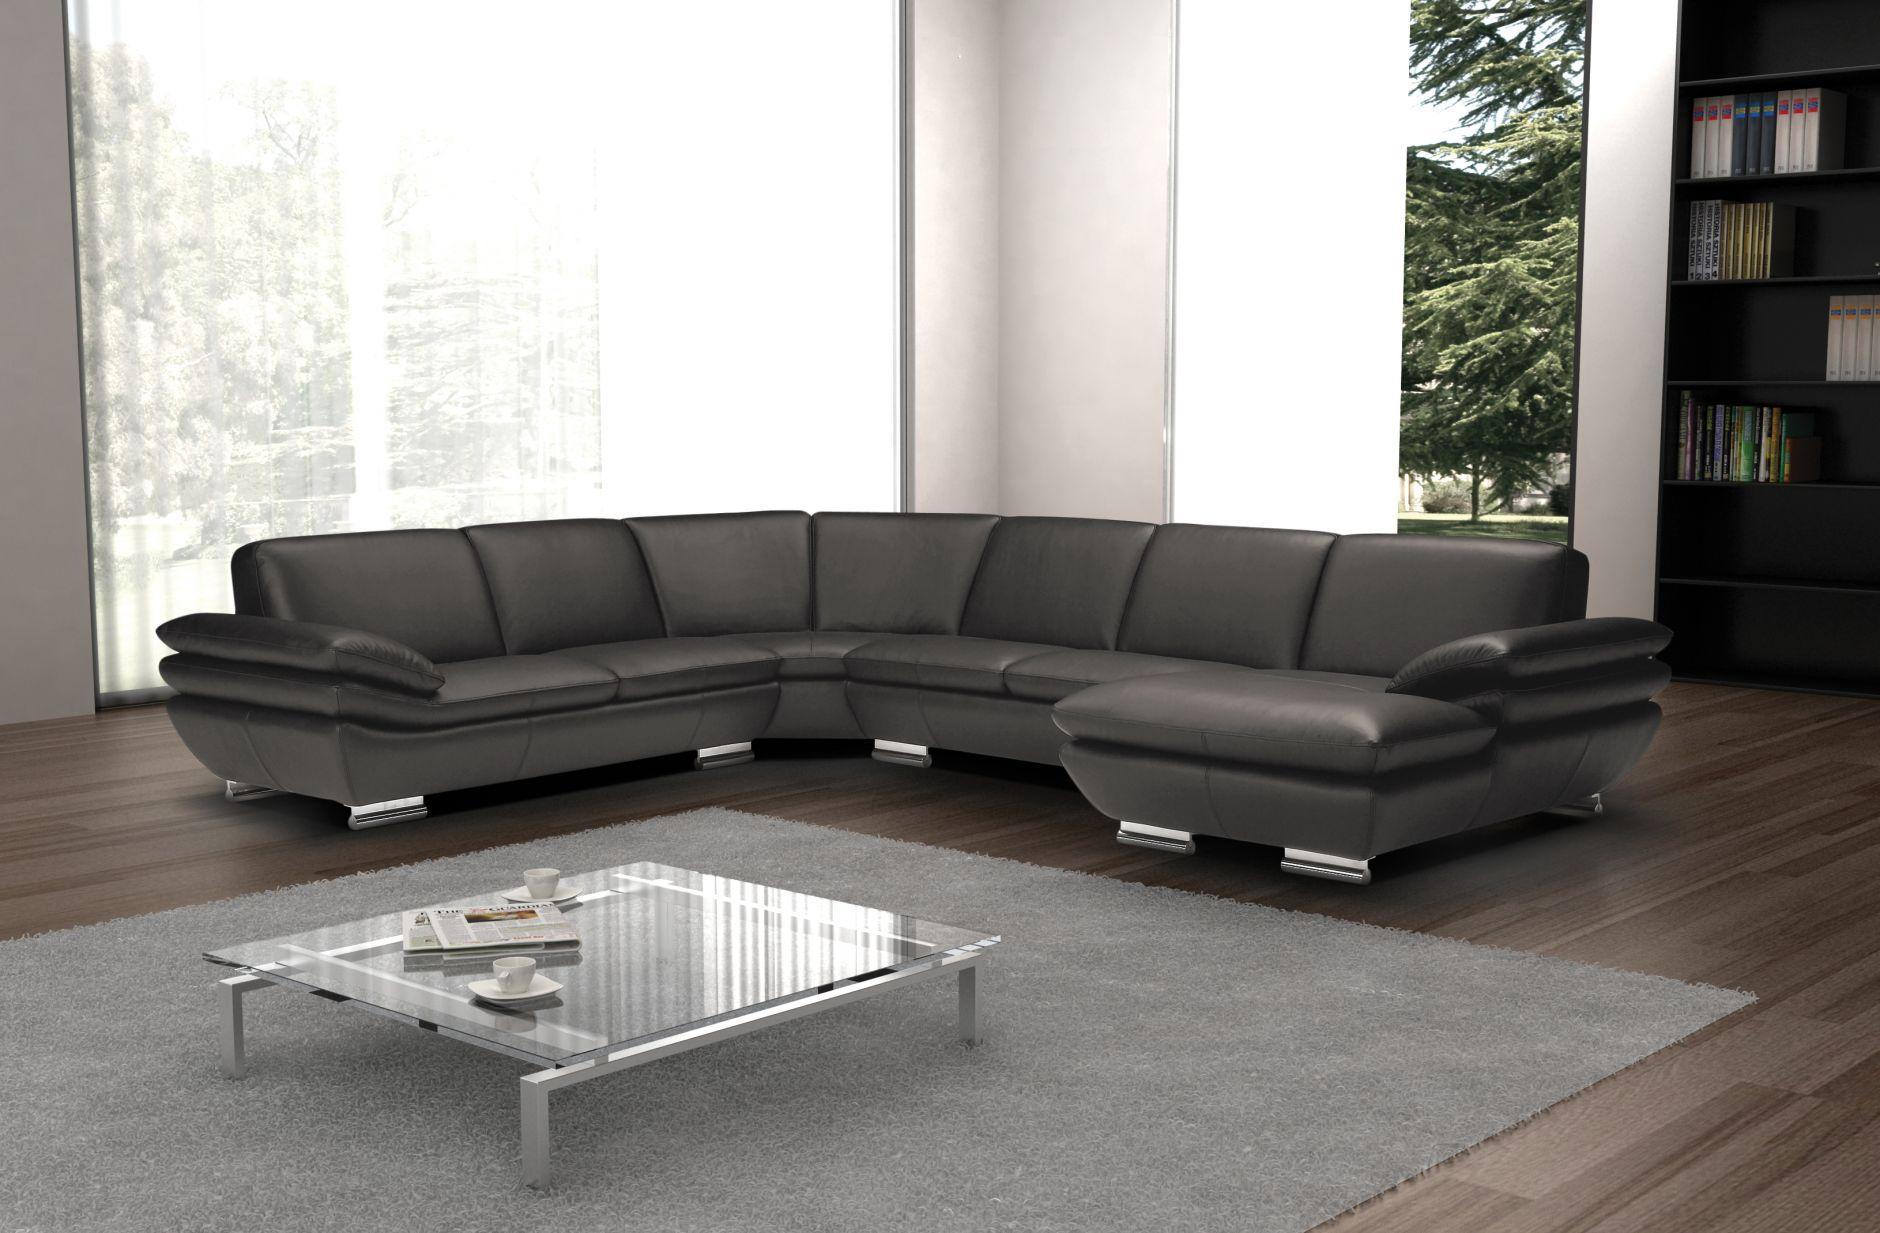 sofa sectionnel sofa sectionnel calia italia s rie. Black Bedroom Furniture Sets. Home Design Ideas